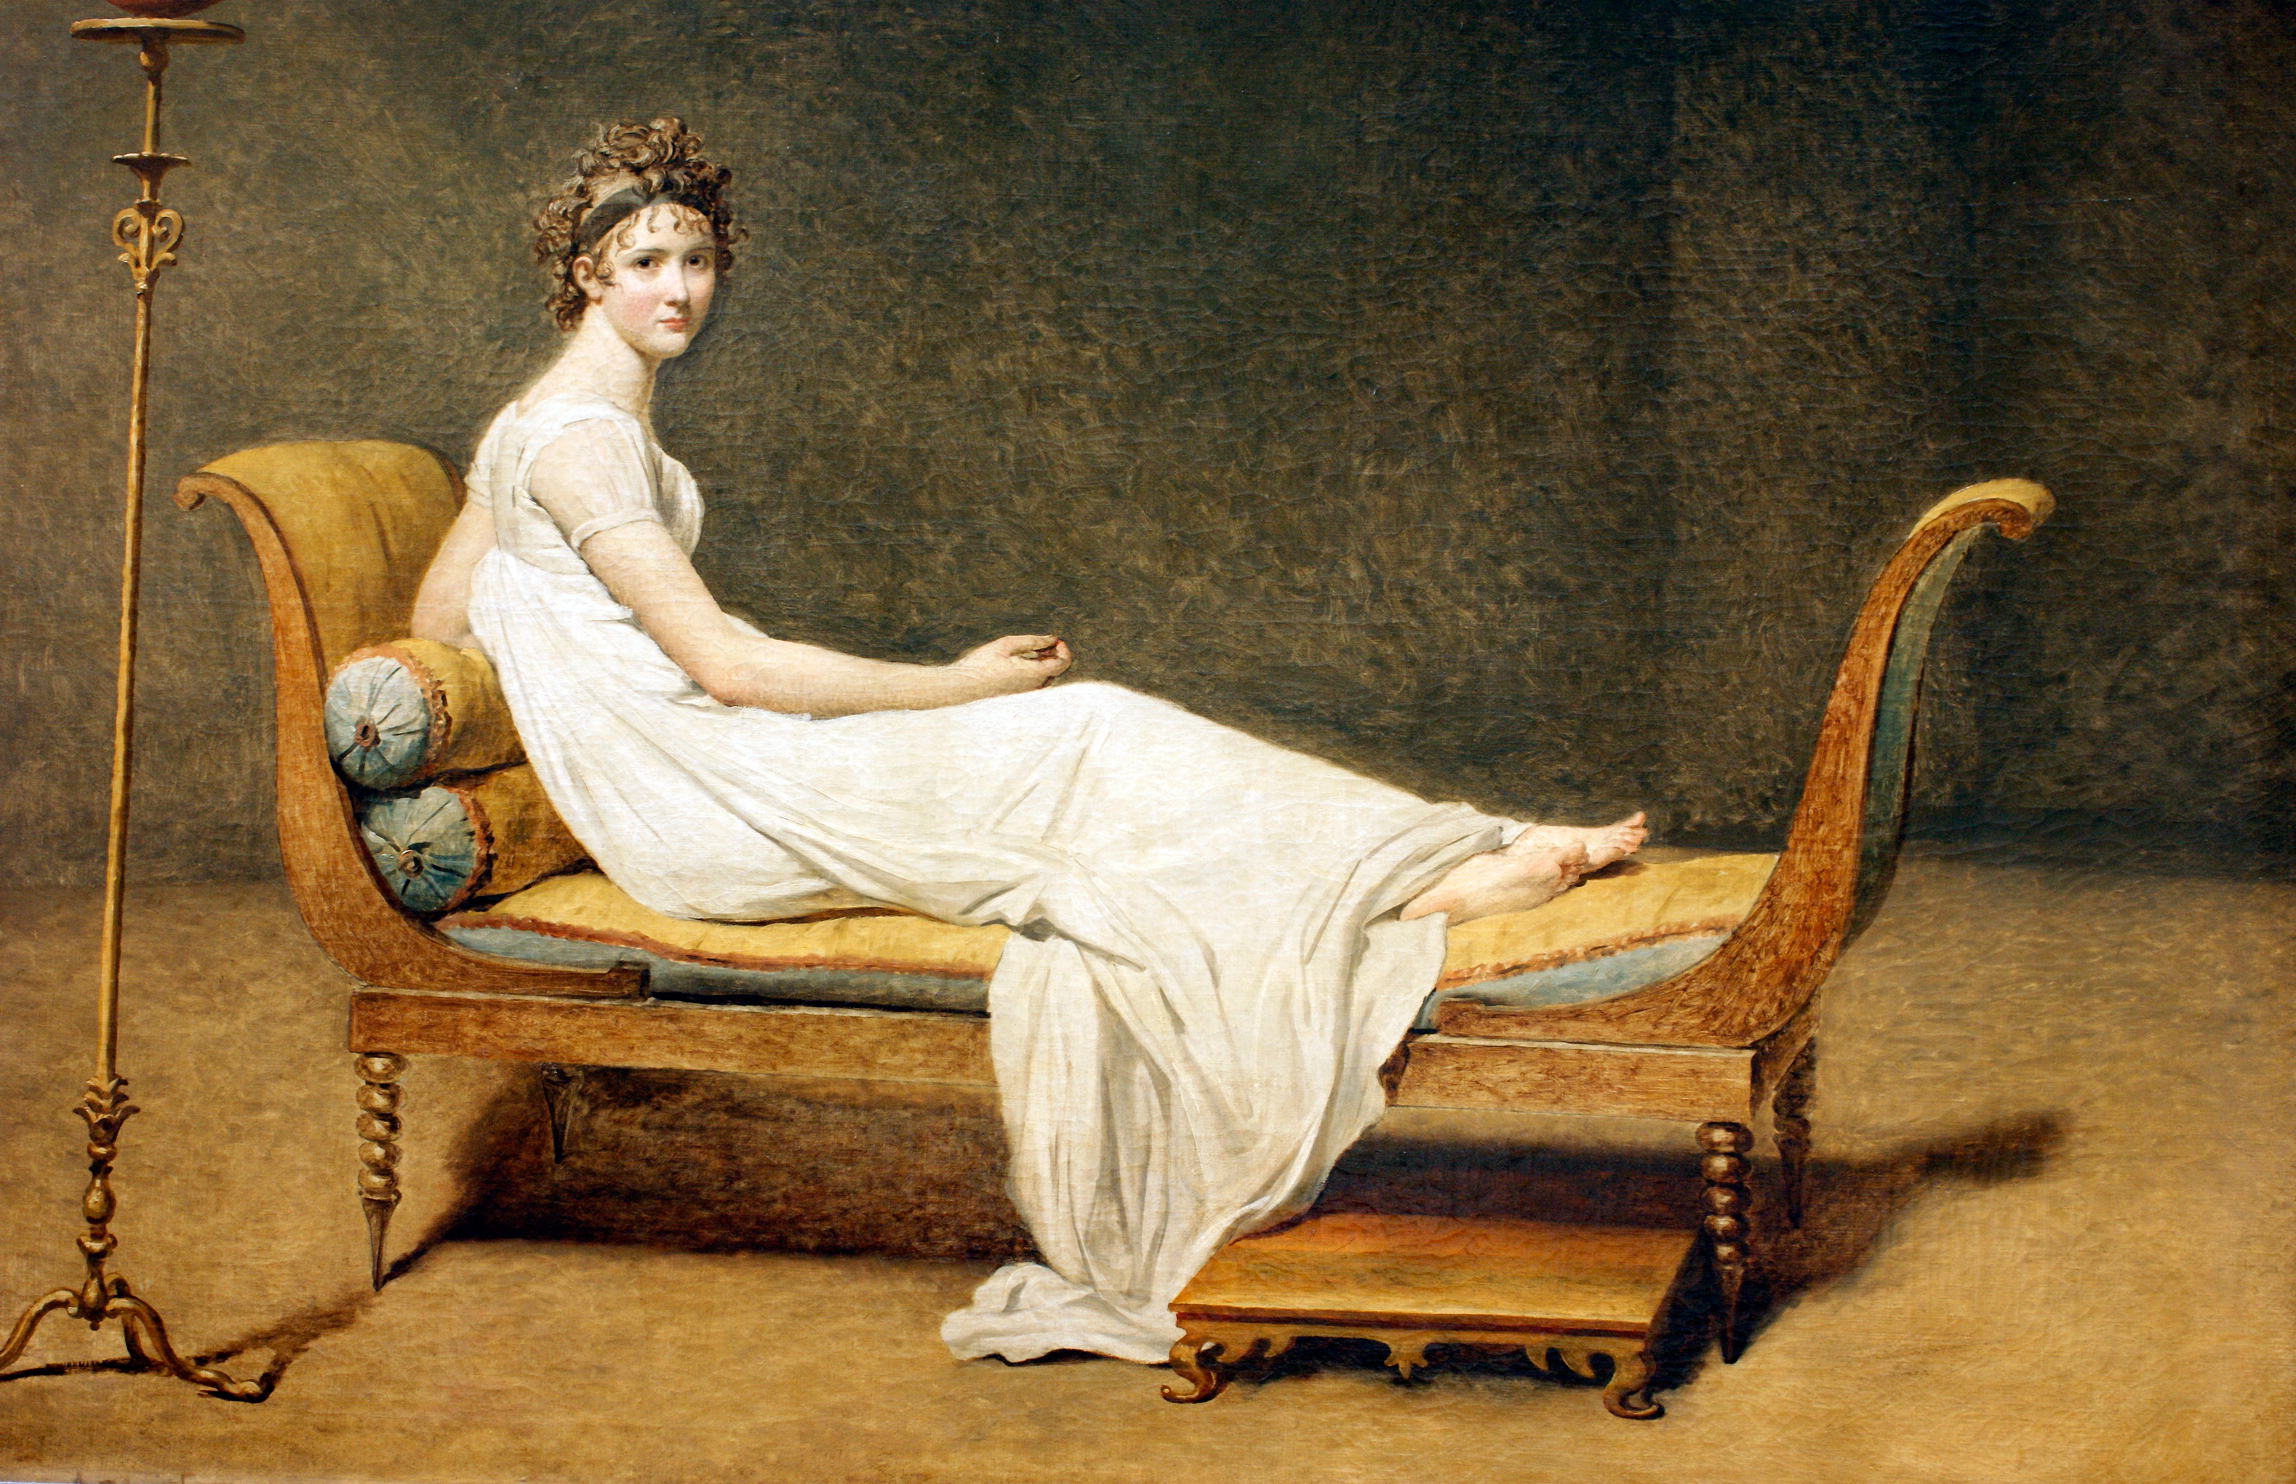 chaiselongue wikipedia File:Madame Récamier by Jacques-Louis David.jpg